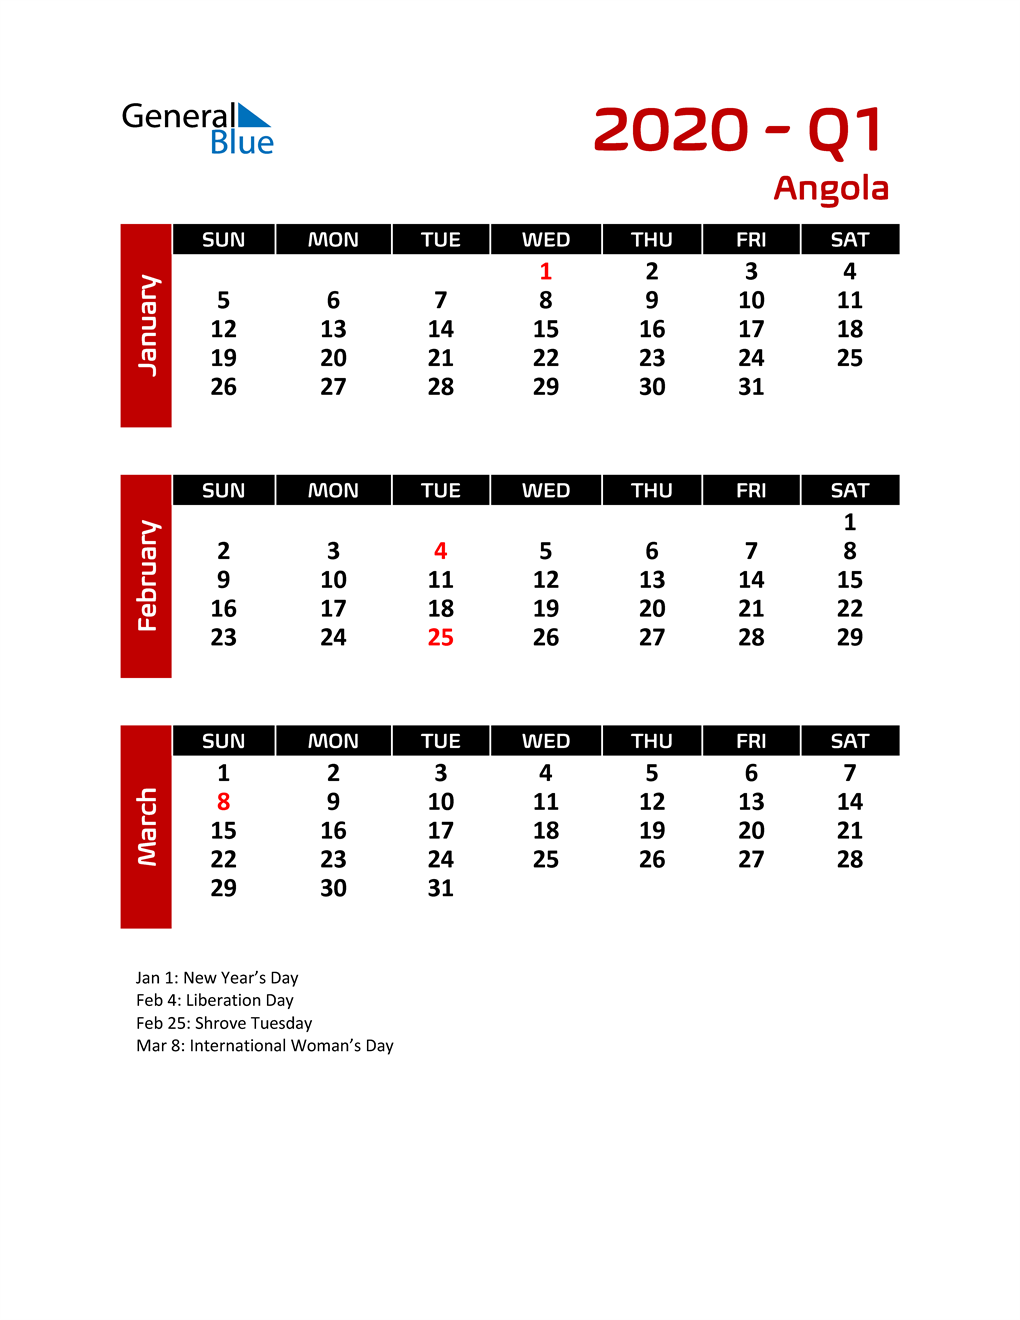 Q1 2020 Calendar with Holidays